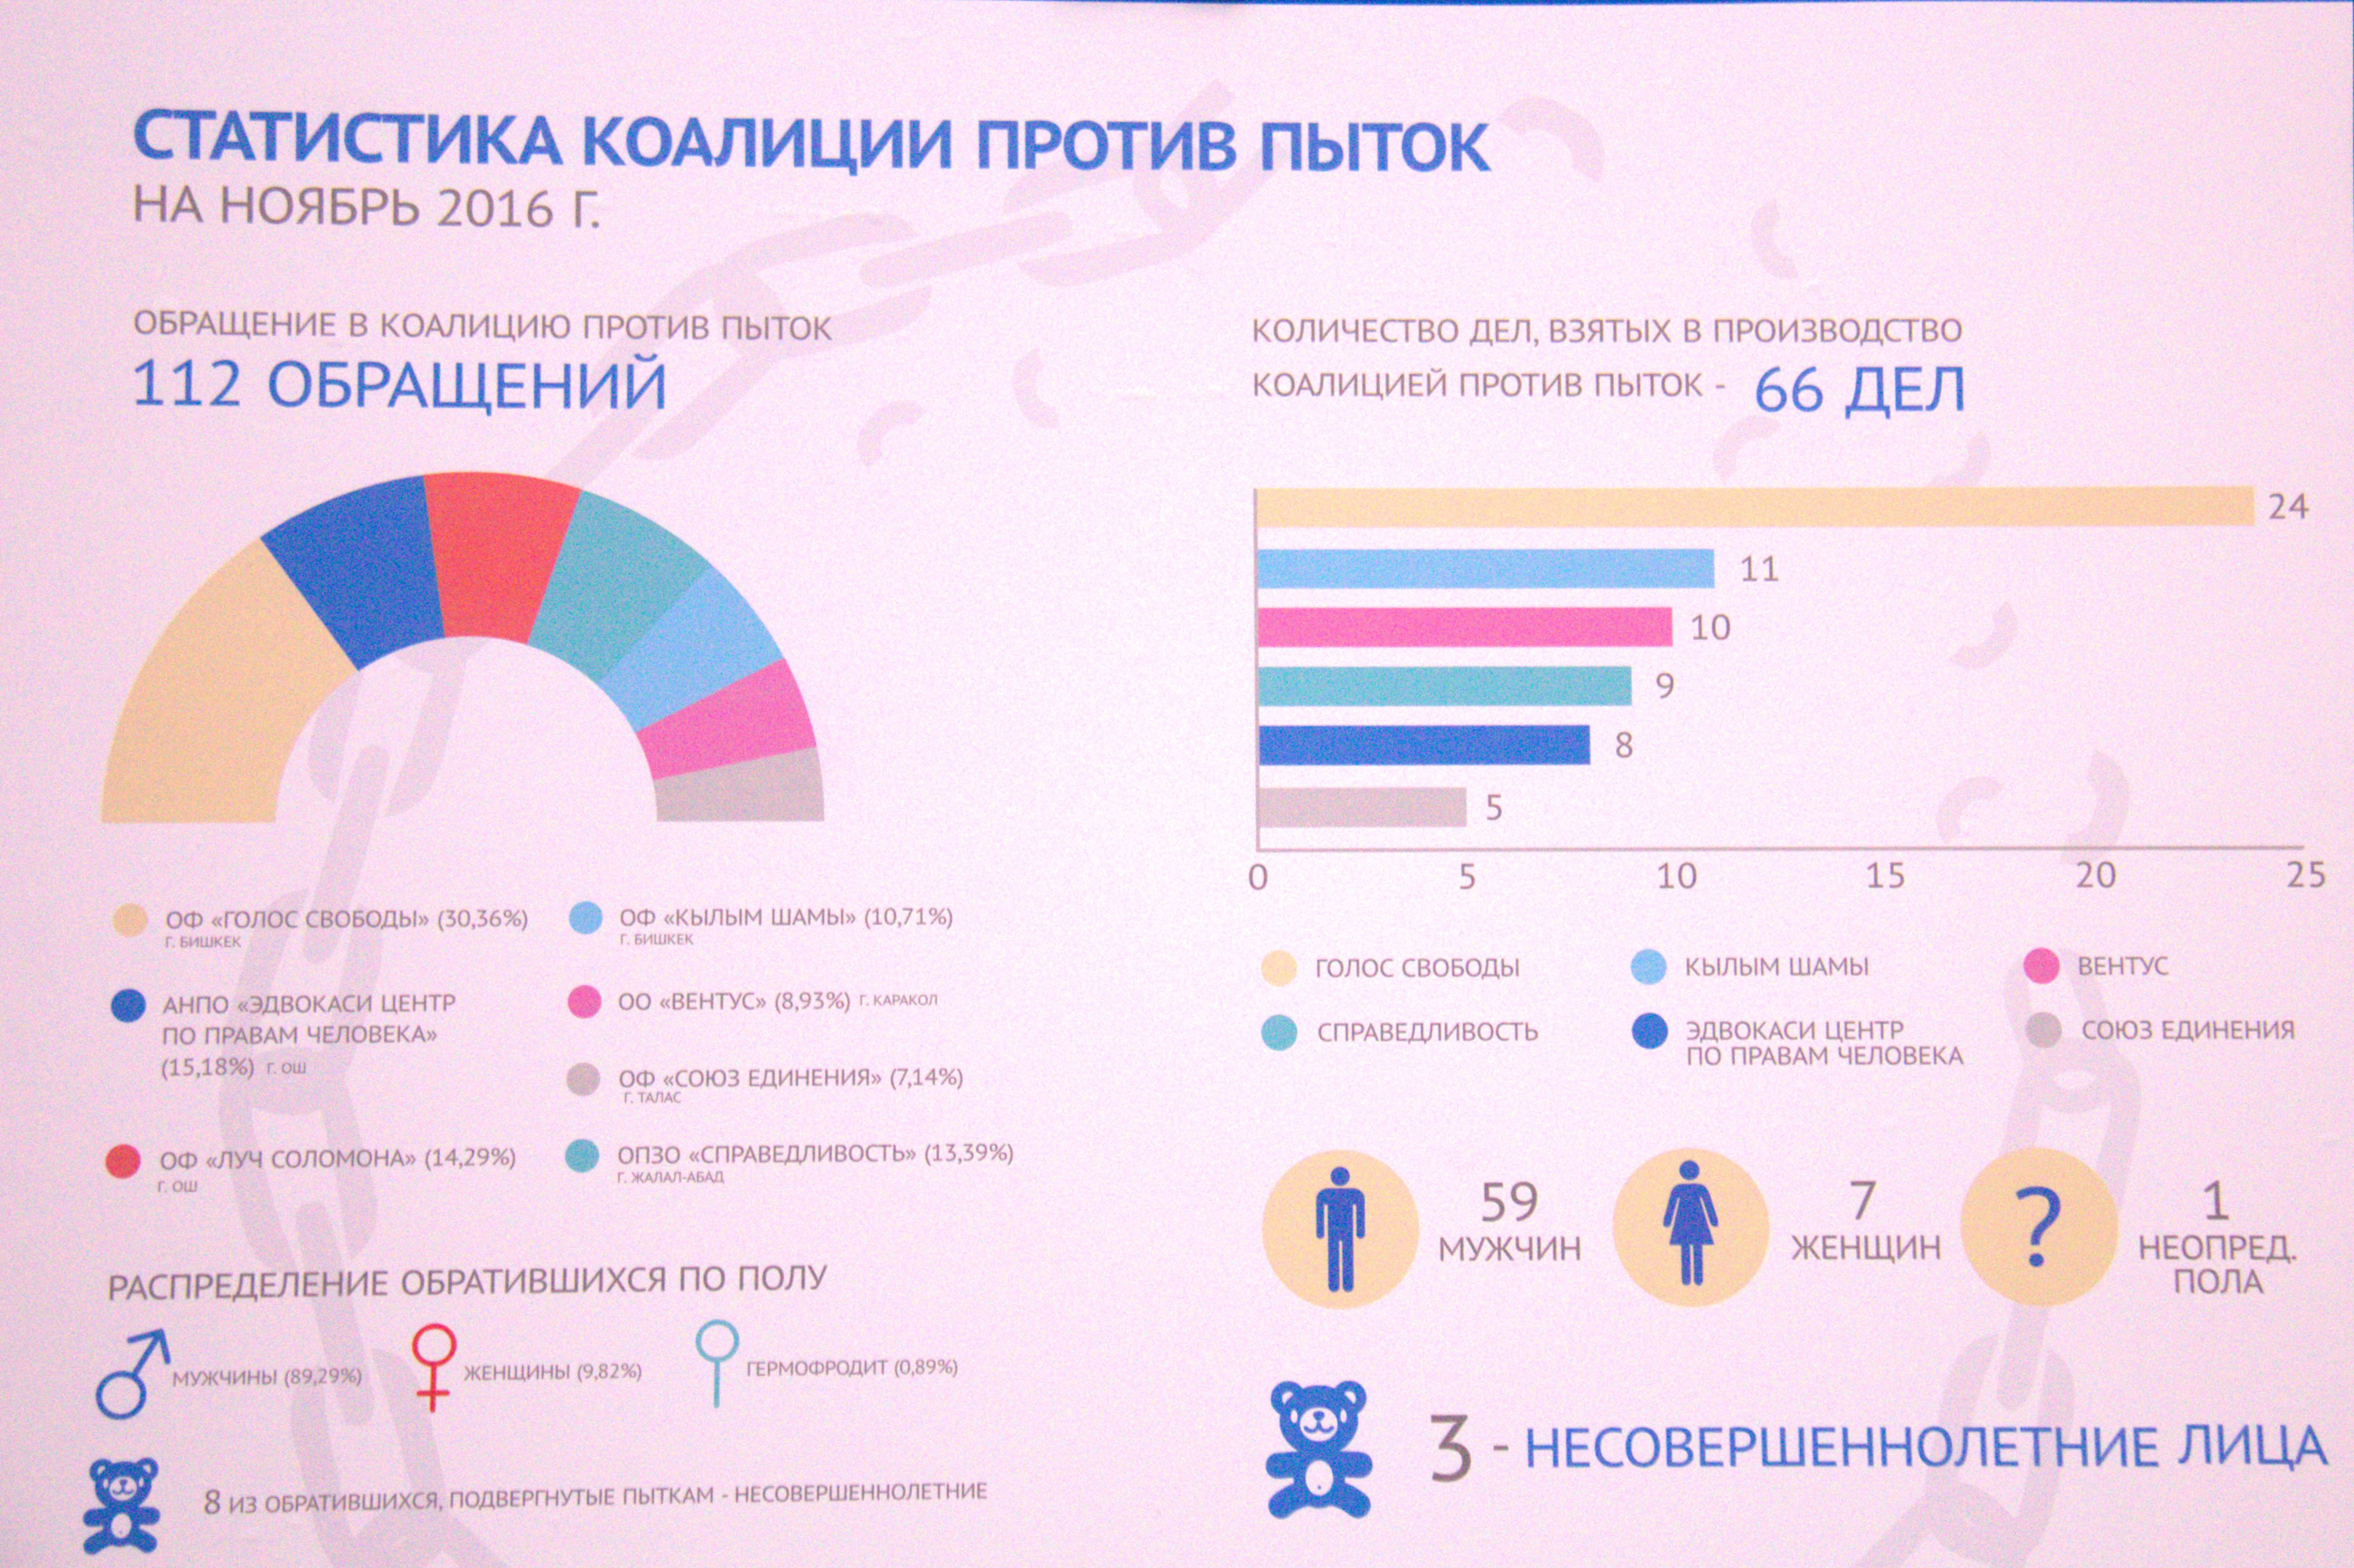 Статистика коалиции против пыток